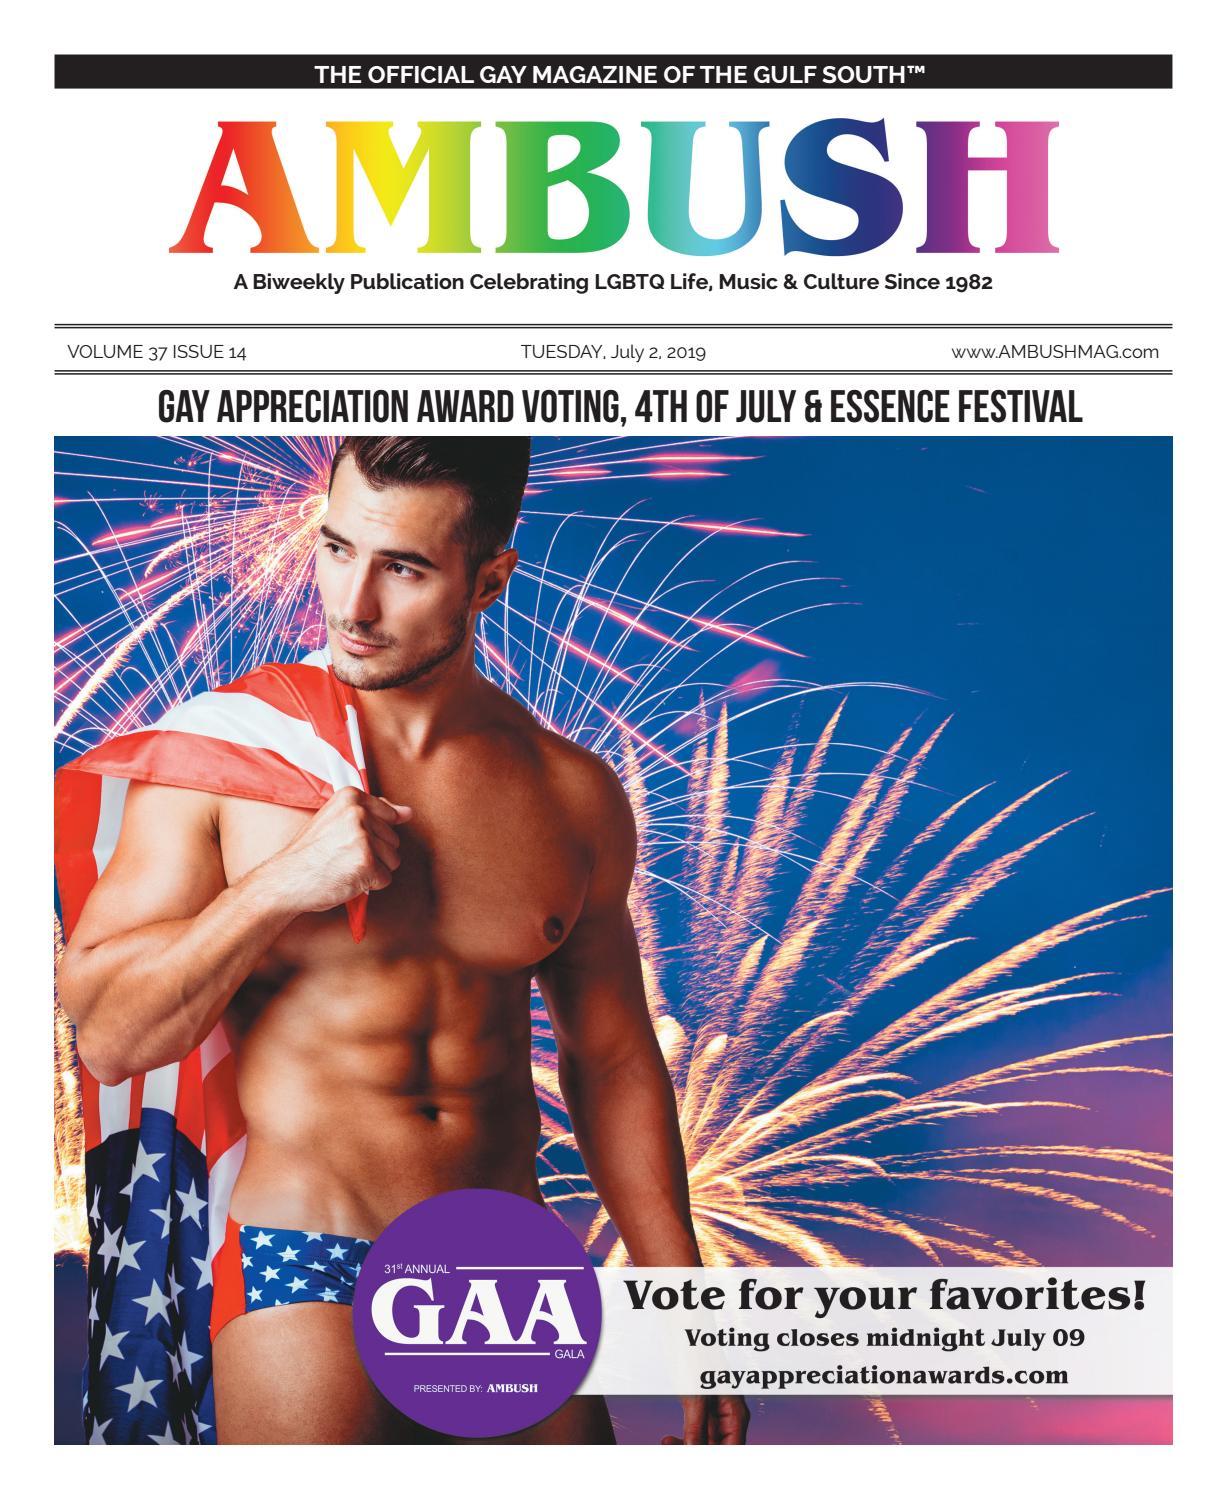 cruzar Leopardo Difuminar  Ambush Magazine Volume 37 Issue 14 by Ambush Publishing - issuu